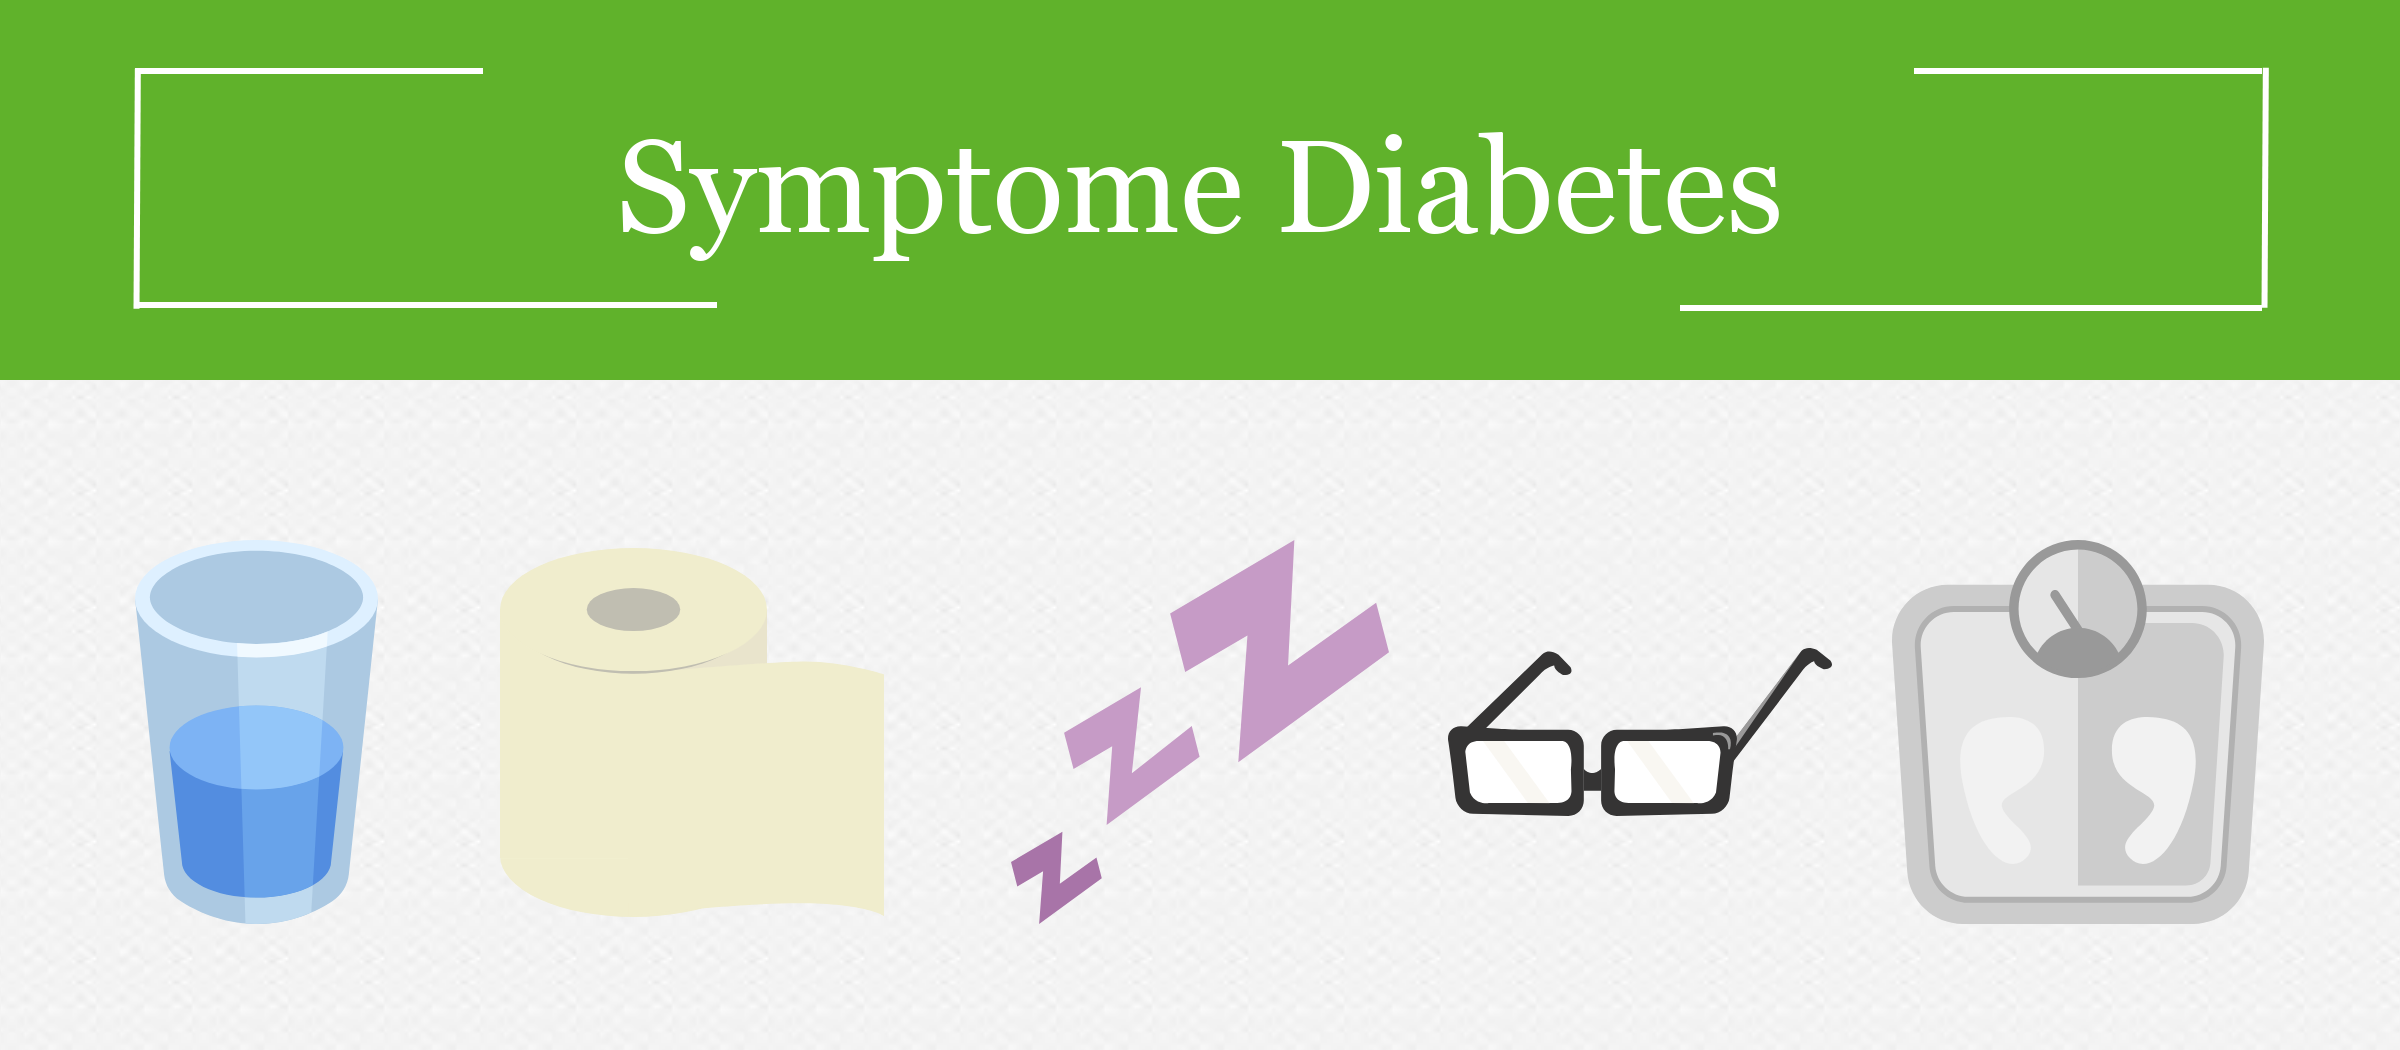 Symptome bei Diabetes